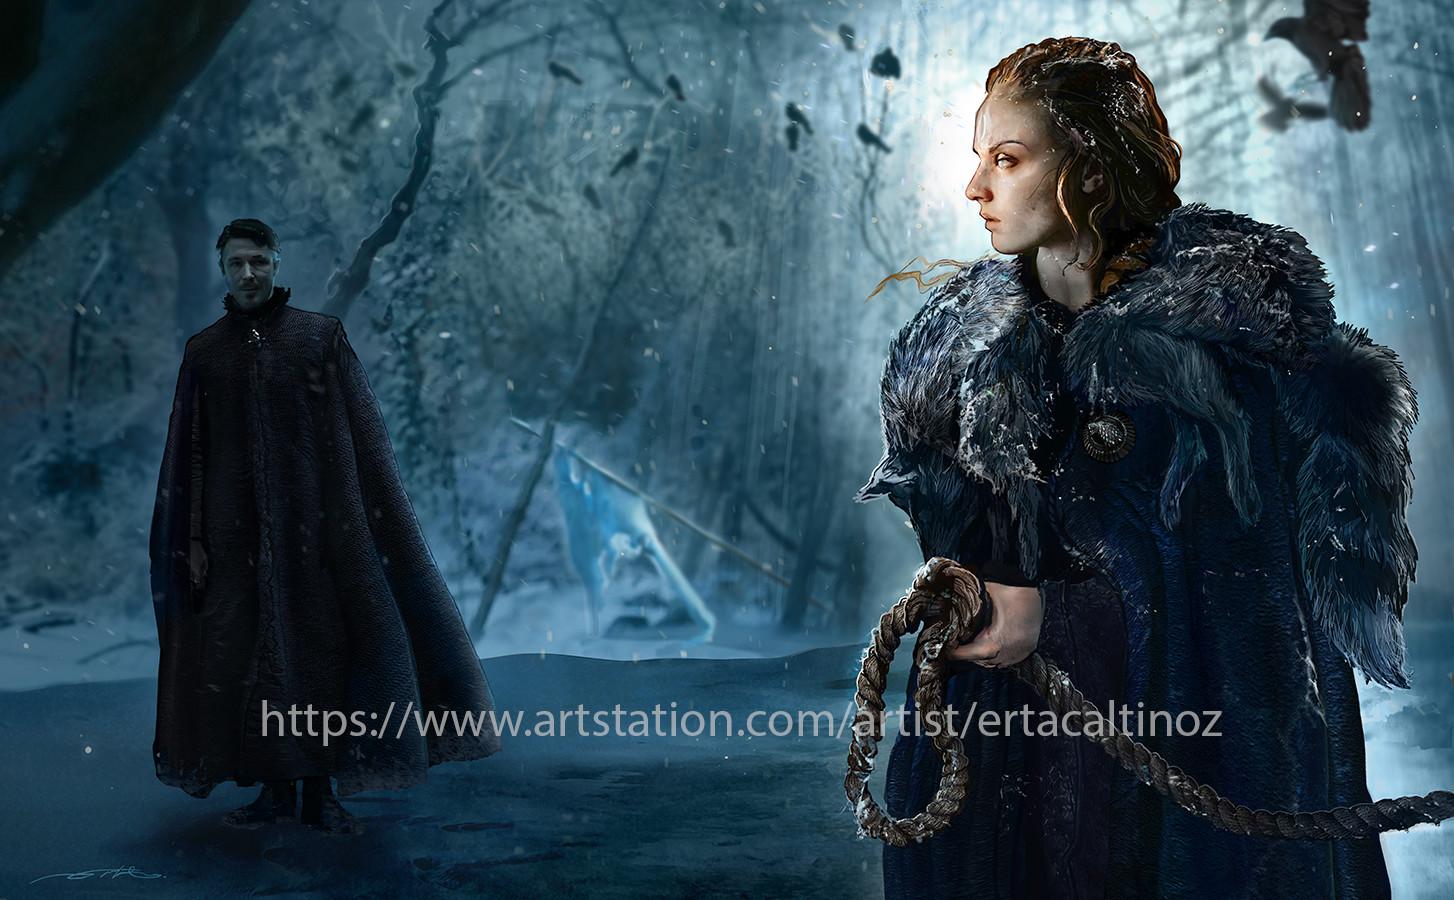 Ertac altinoz a woman s courage